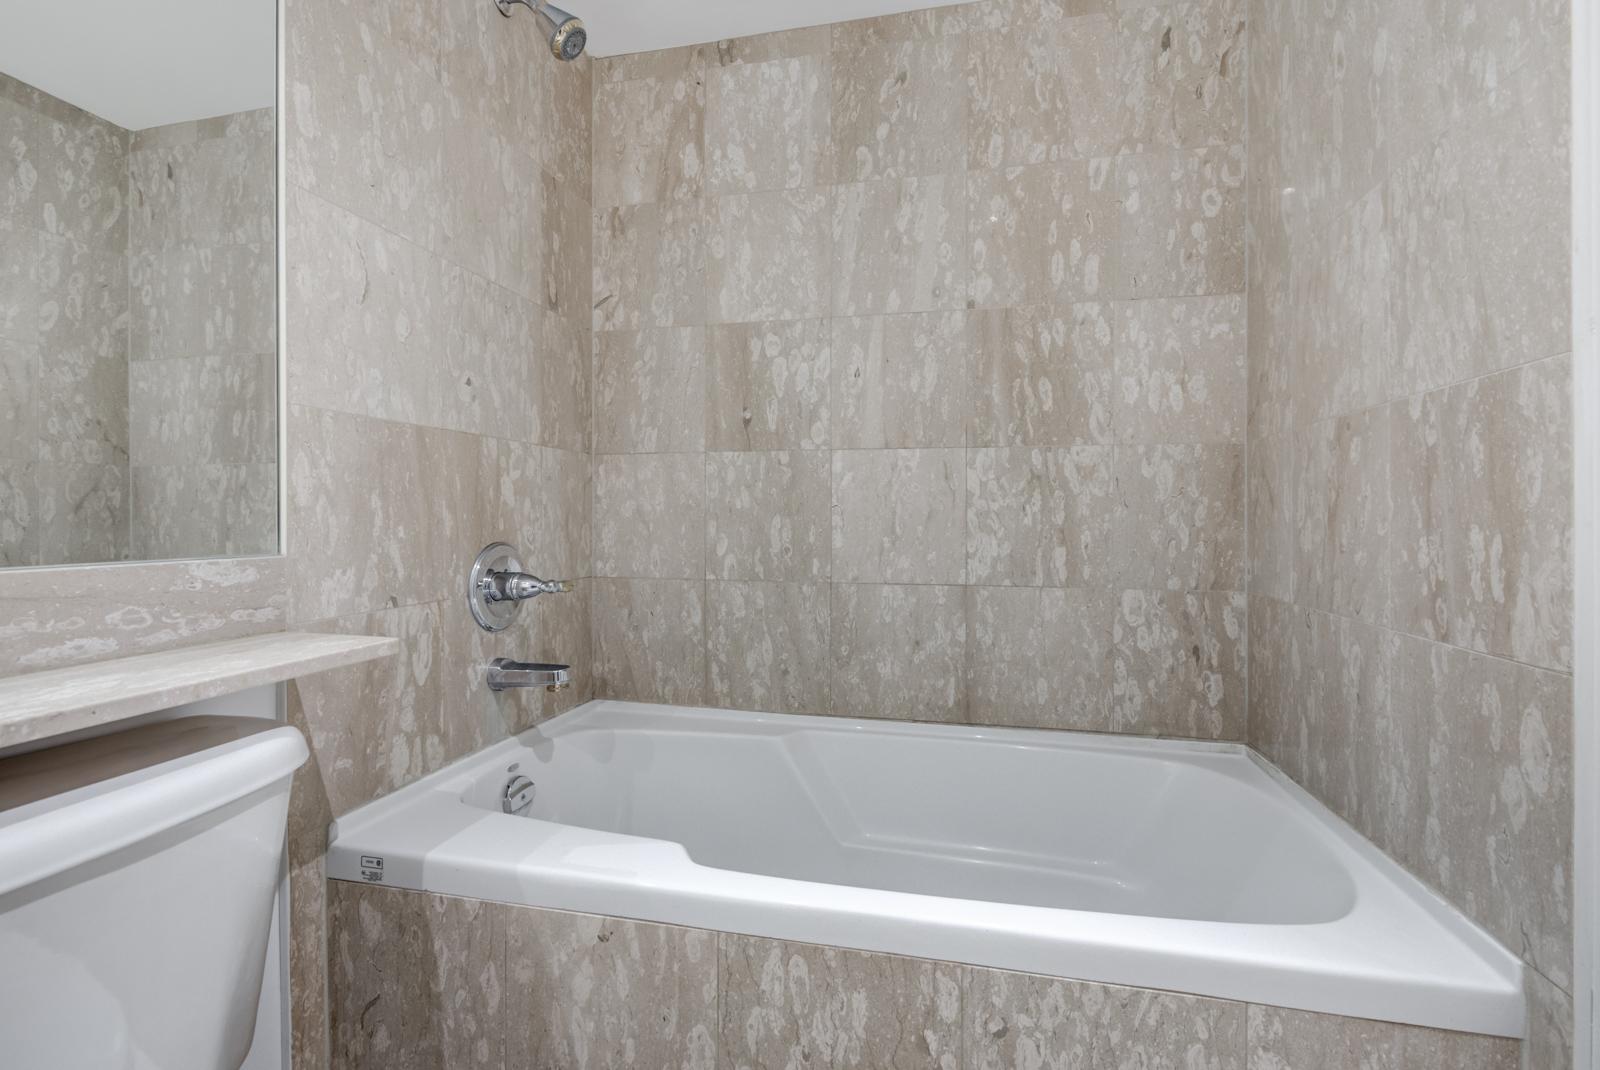 Closeup of 140 Simcoe St E Unit 921 soaker tub with tiles and white trim.